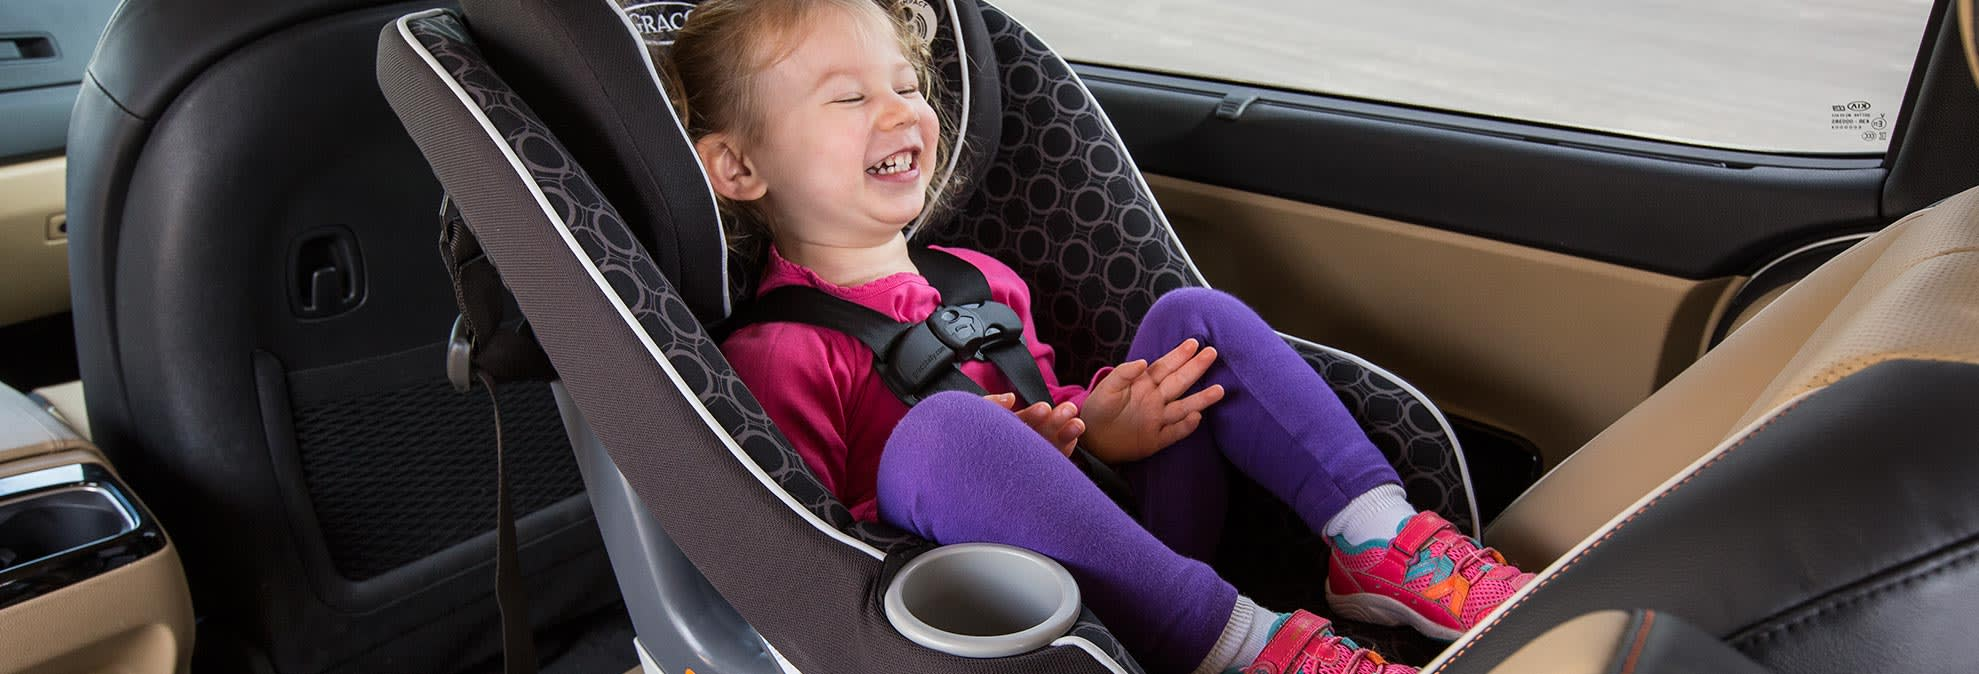 Why Kids Should Stay Longer in Rear-Facing Car Seats